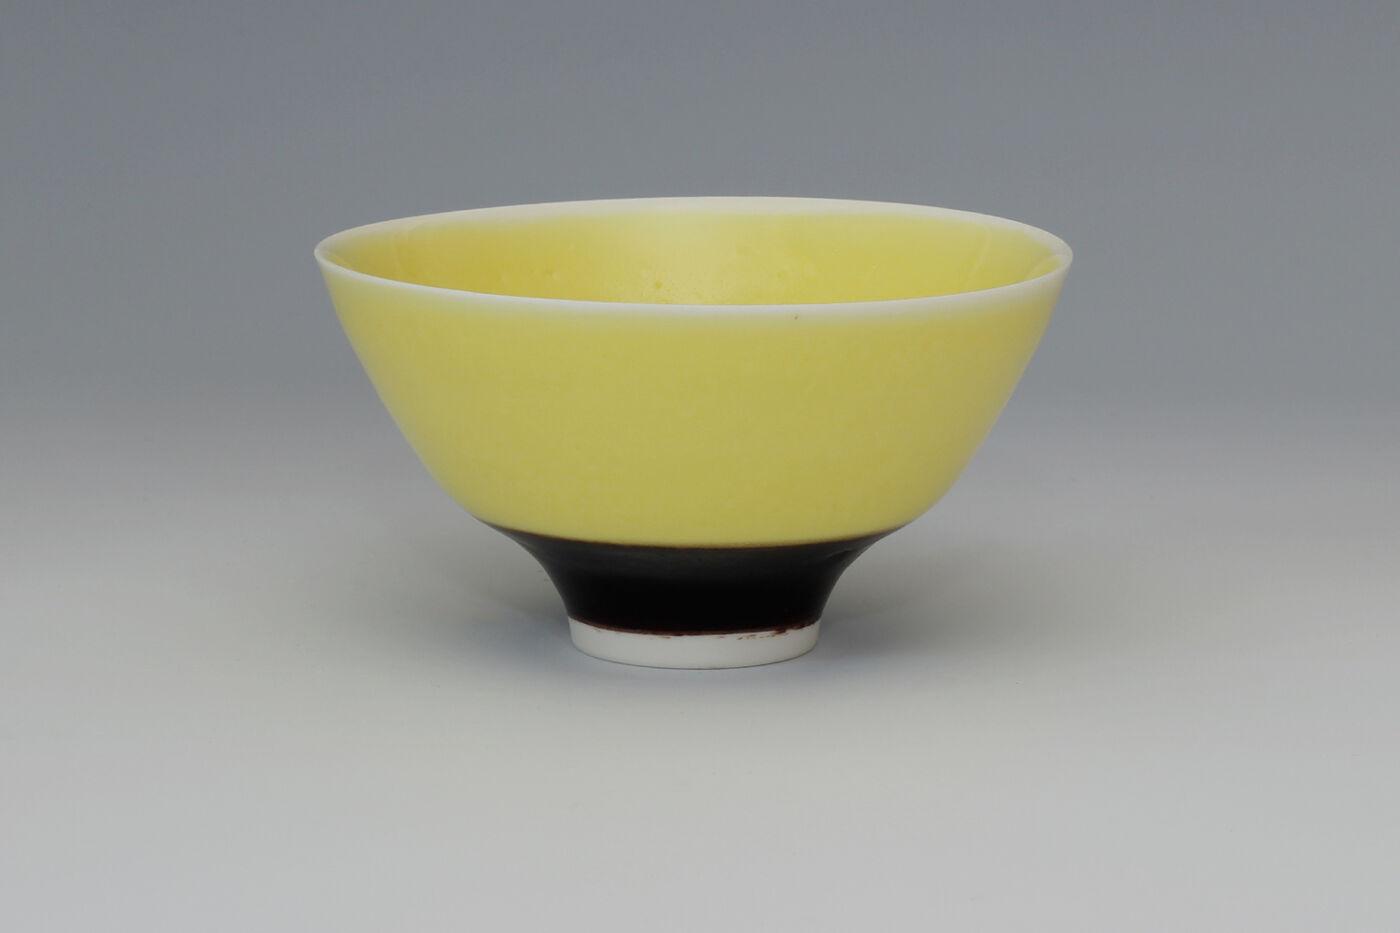 Peter Wills Yellow Porcelain Bowl 167